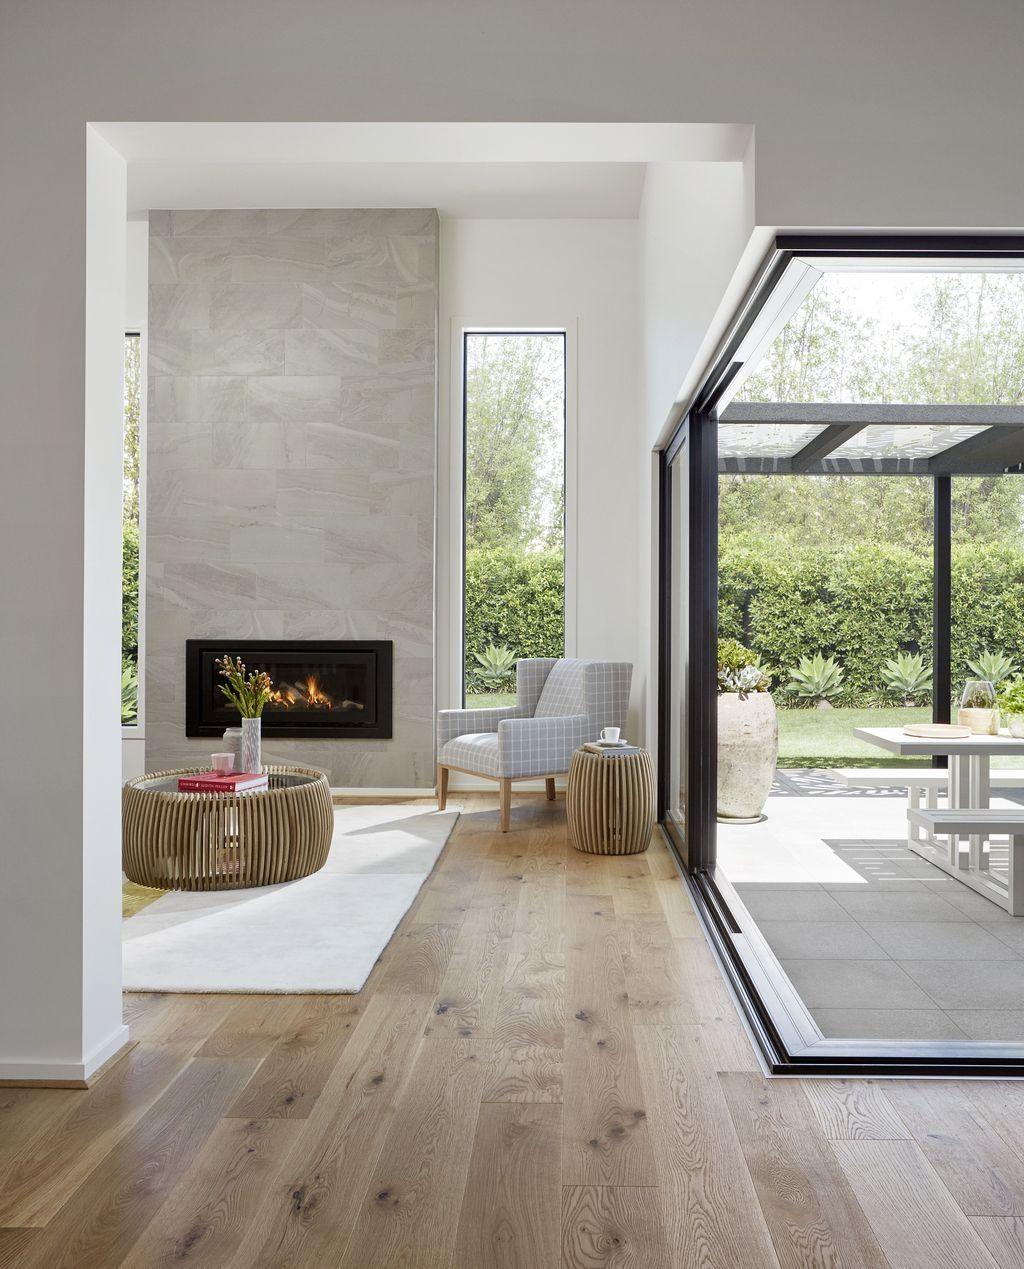 39 Adorable Contemporary Living Room Design Ideas images